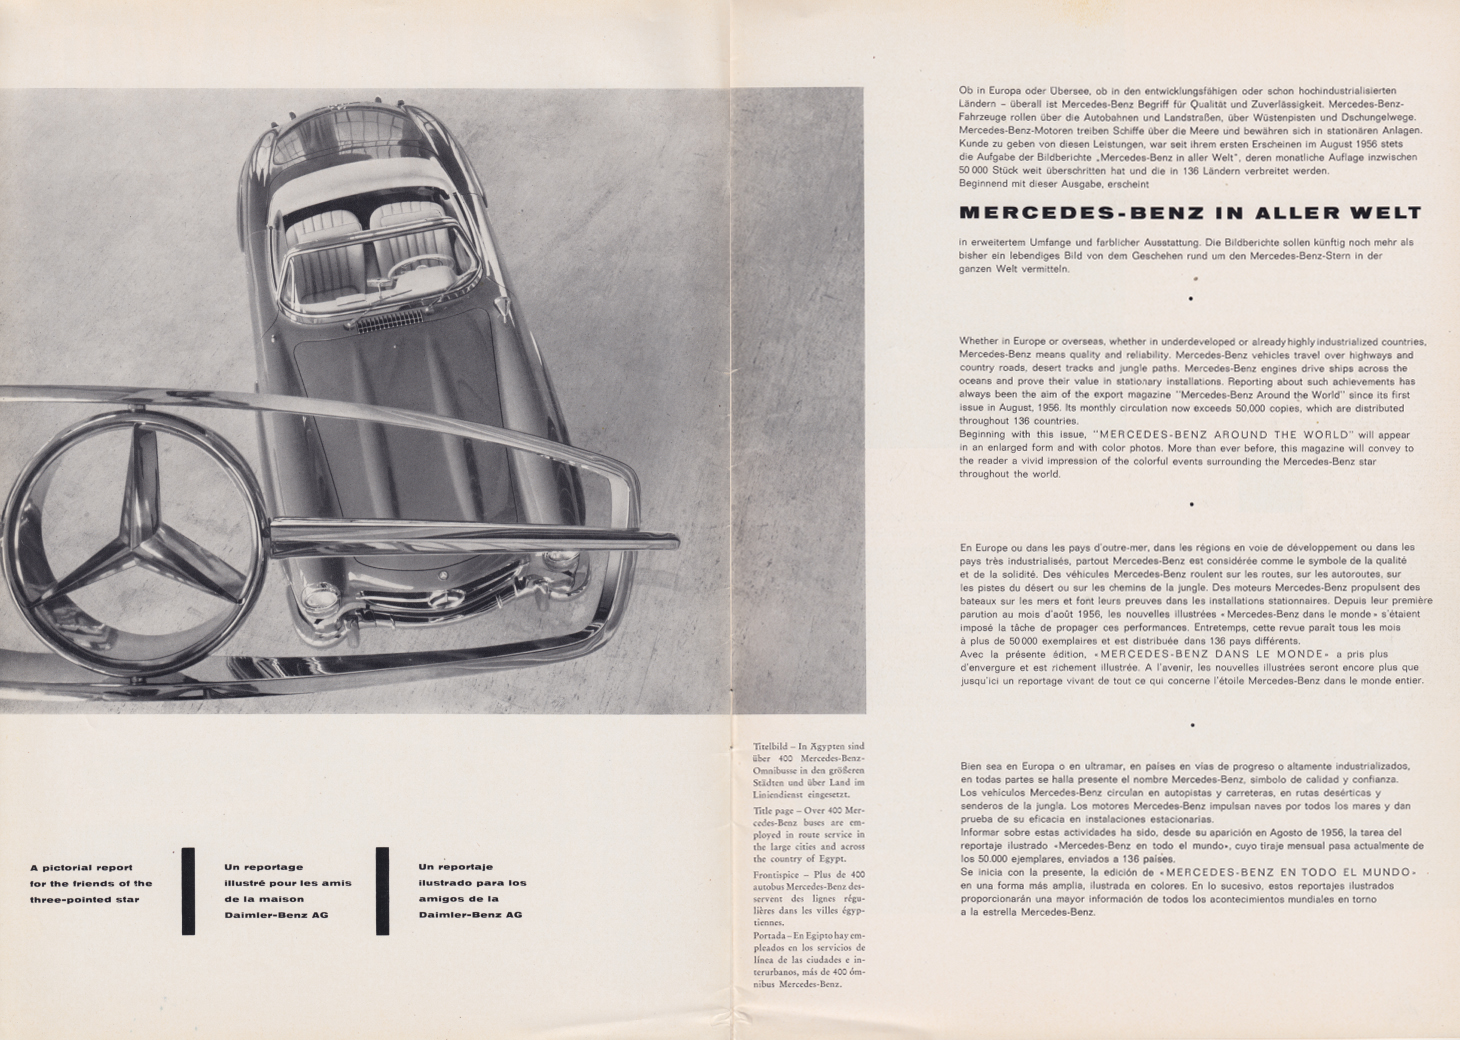 (REVISTA): Periódico In aller welt n.º 29 - Mercedes-Benz no mundo - 1959 - multilingue 002